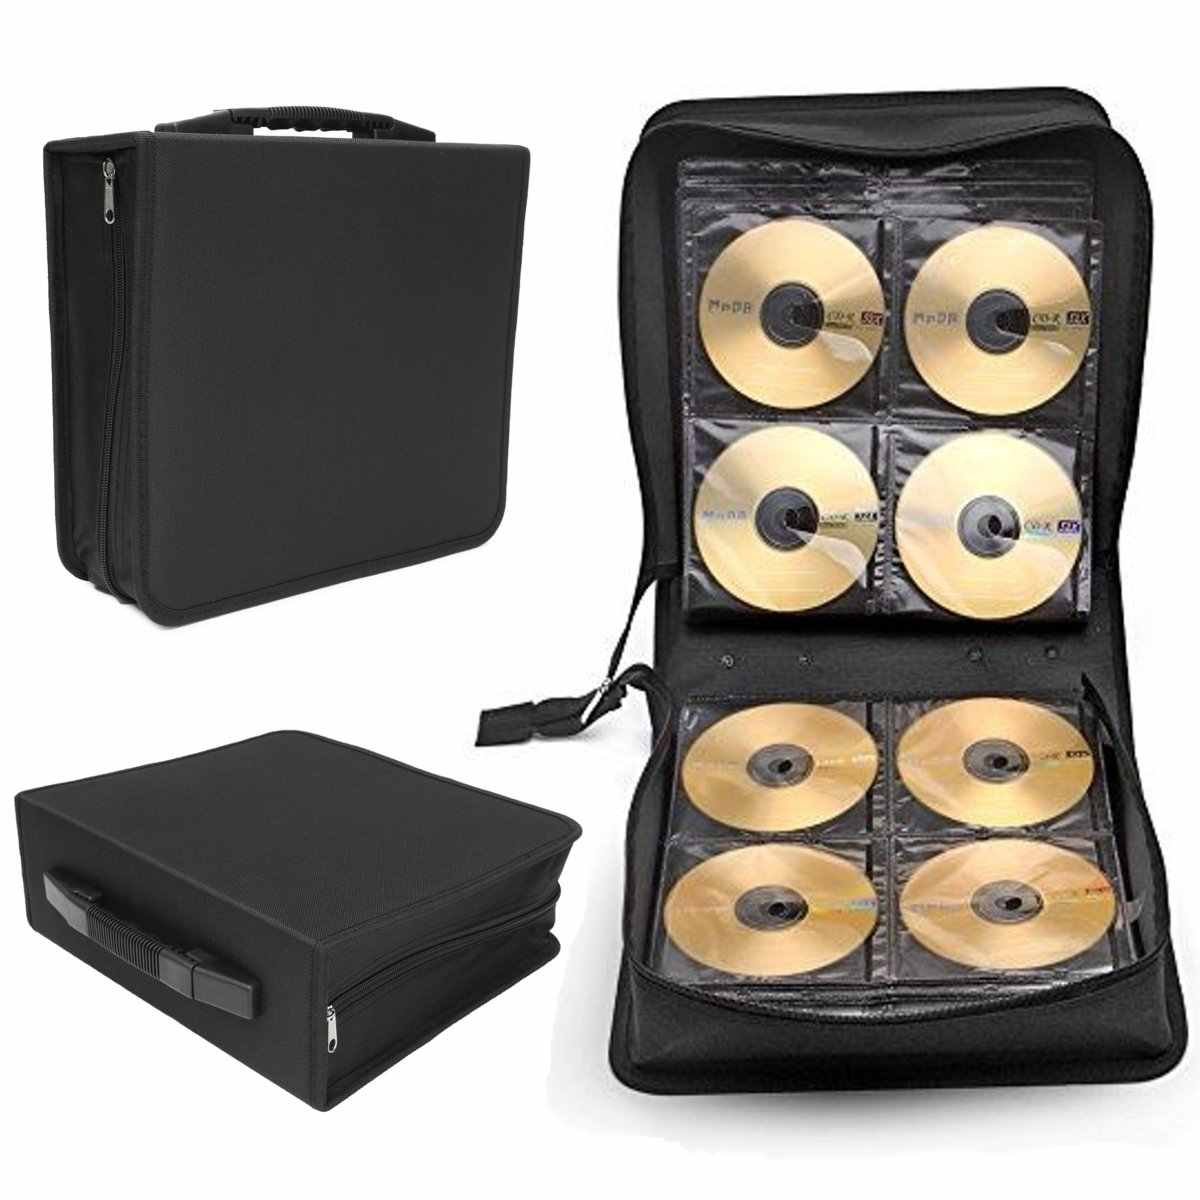 Large 288 Disc Cd Dvd Storage Box Case Oxford Cloth Carry Bag Binder Book Sleeves Rack Holder Home Room Discs Storage Helper Storage Box Case Storage Boxbox Case Aliexpress